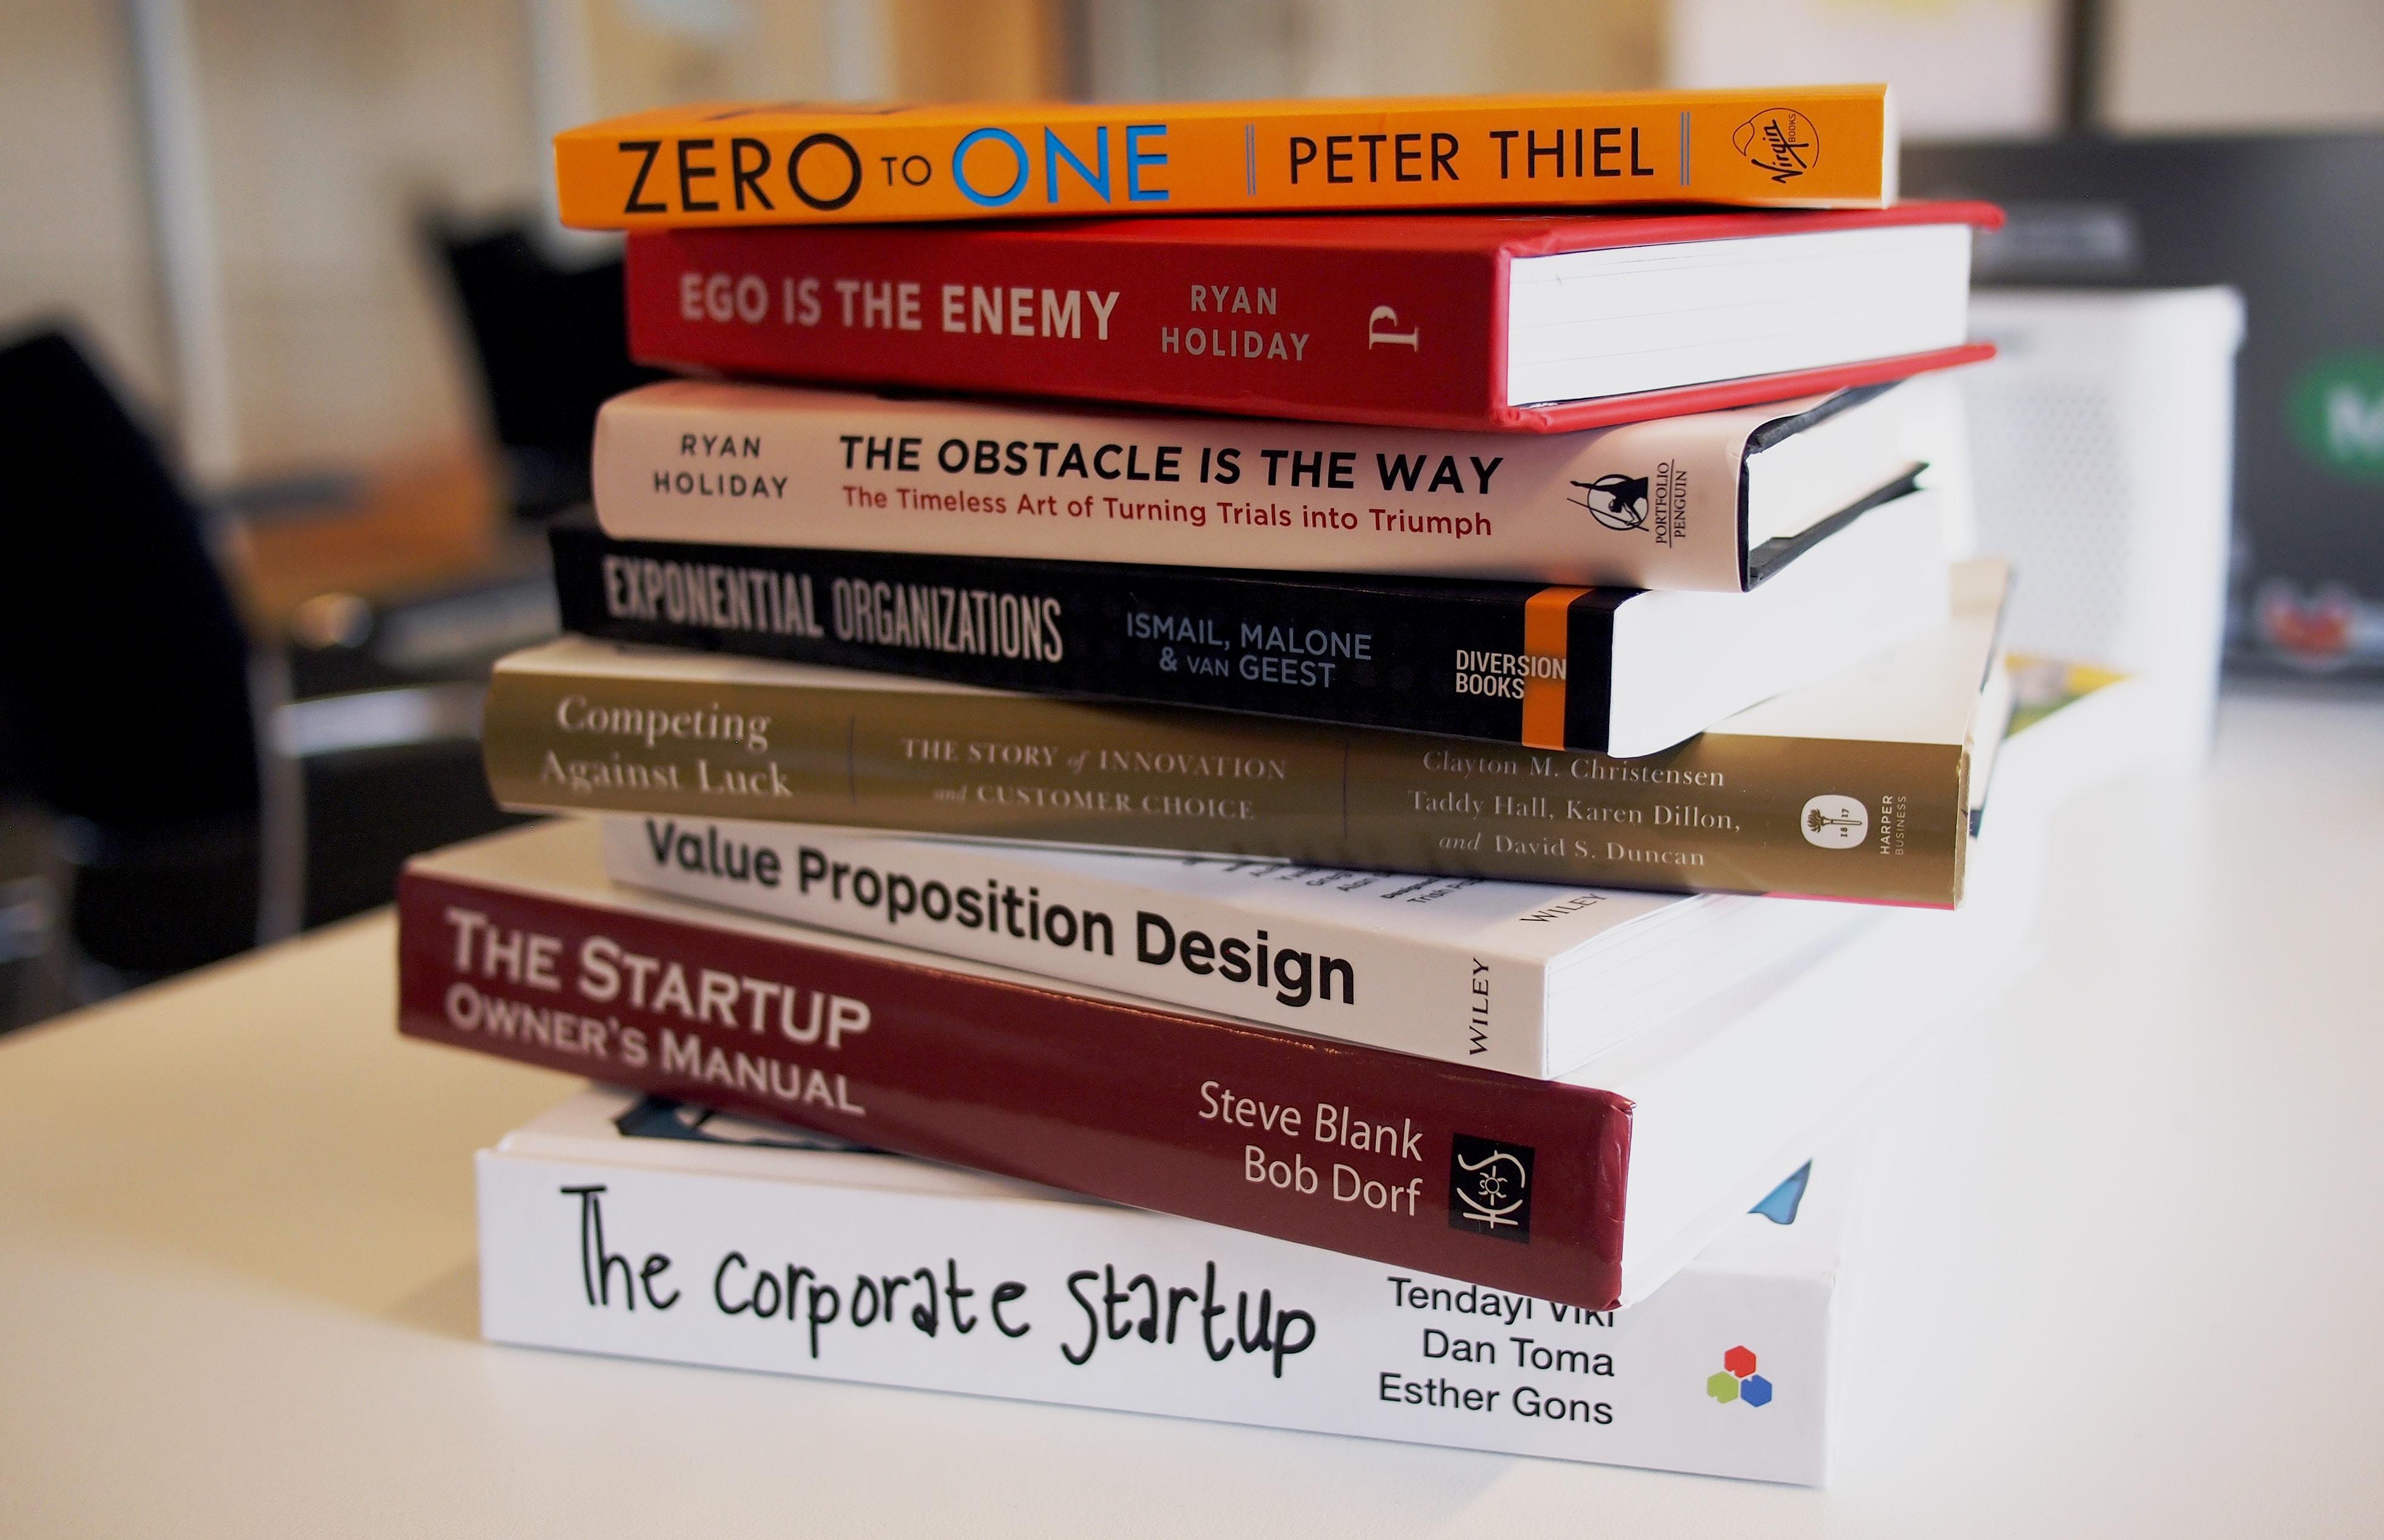 Books. Photo by Daria Nepriakhina on Unsplash